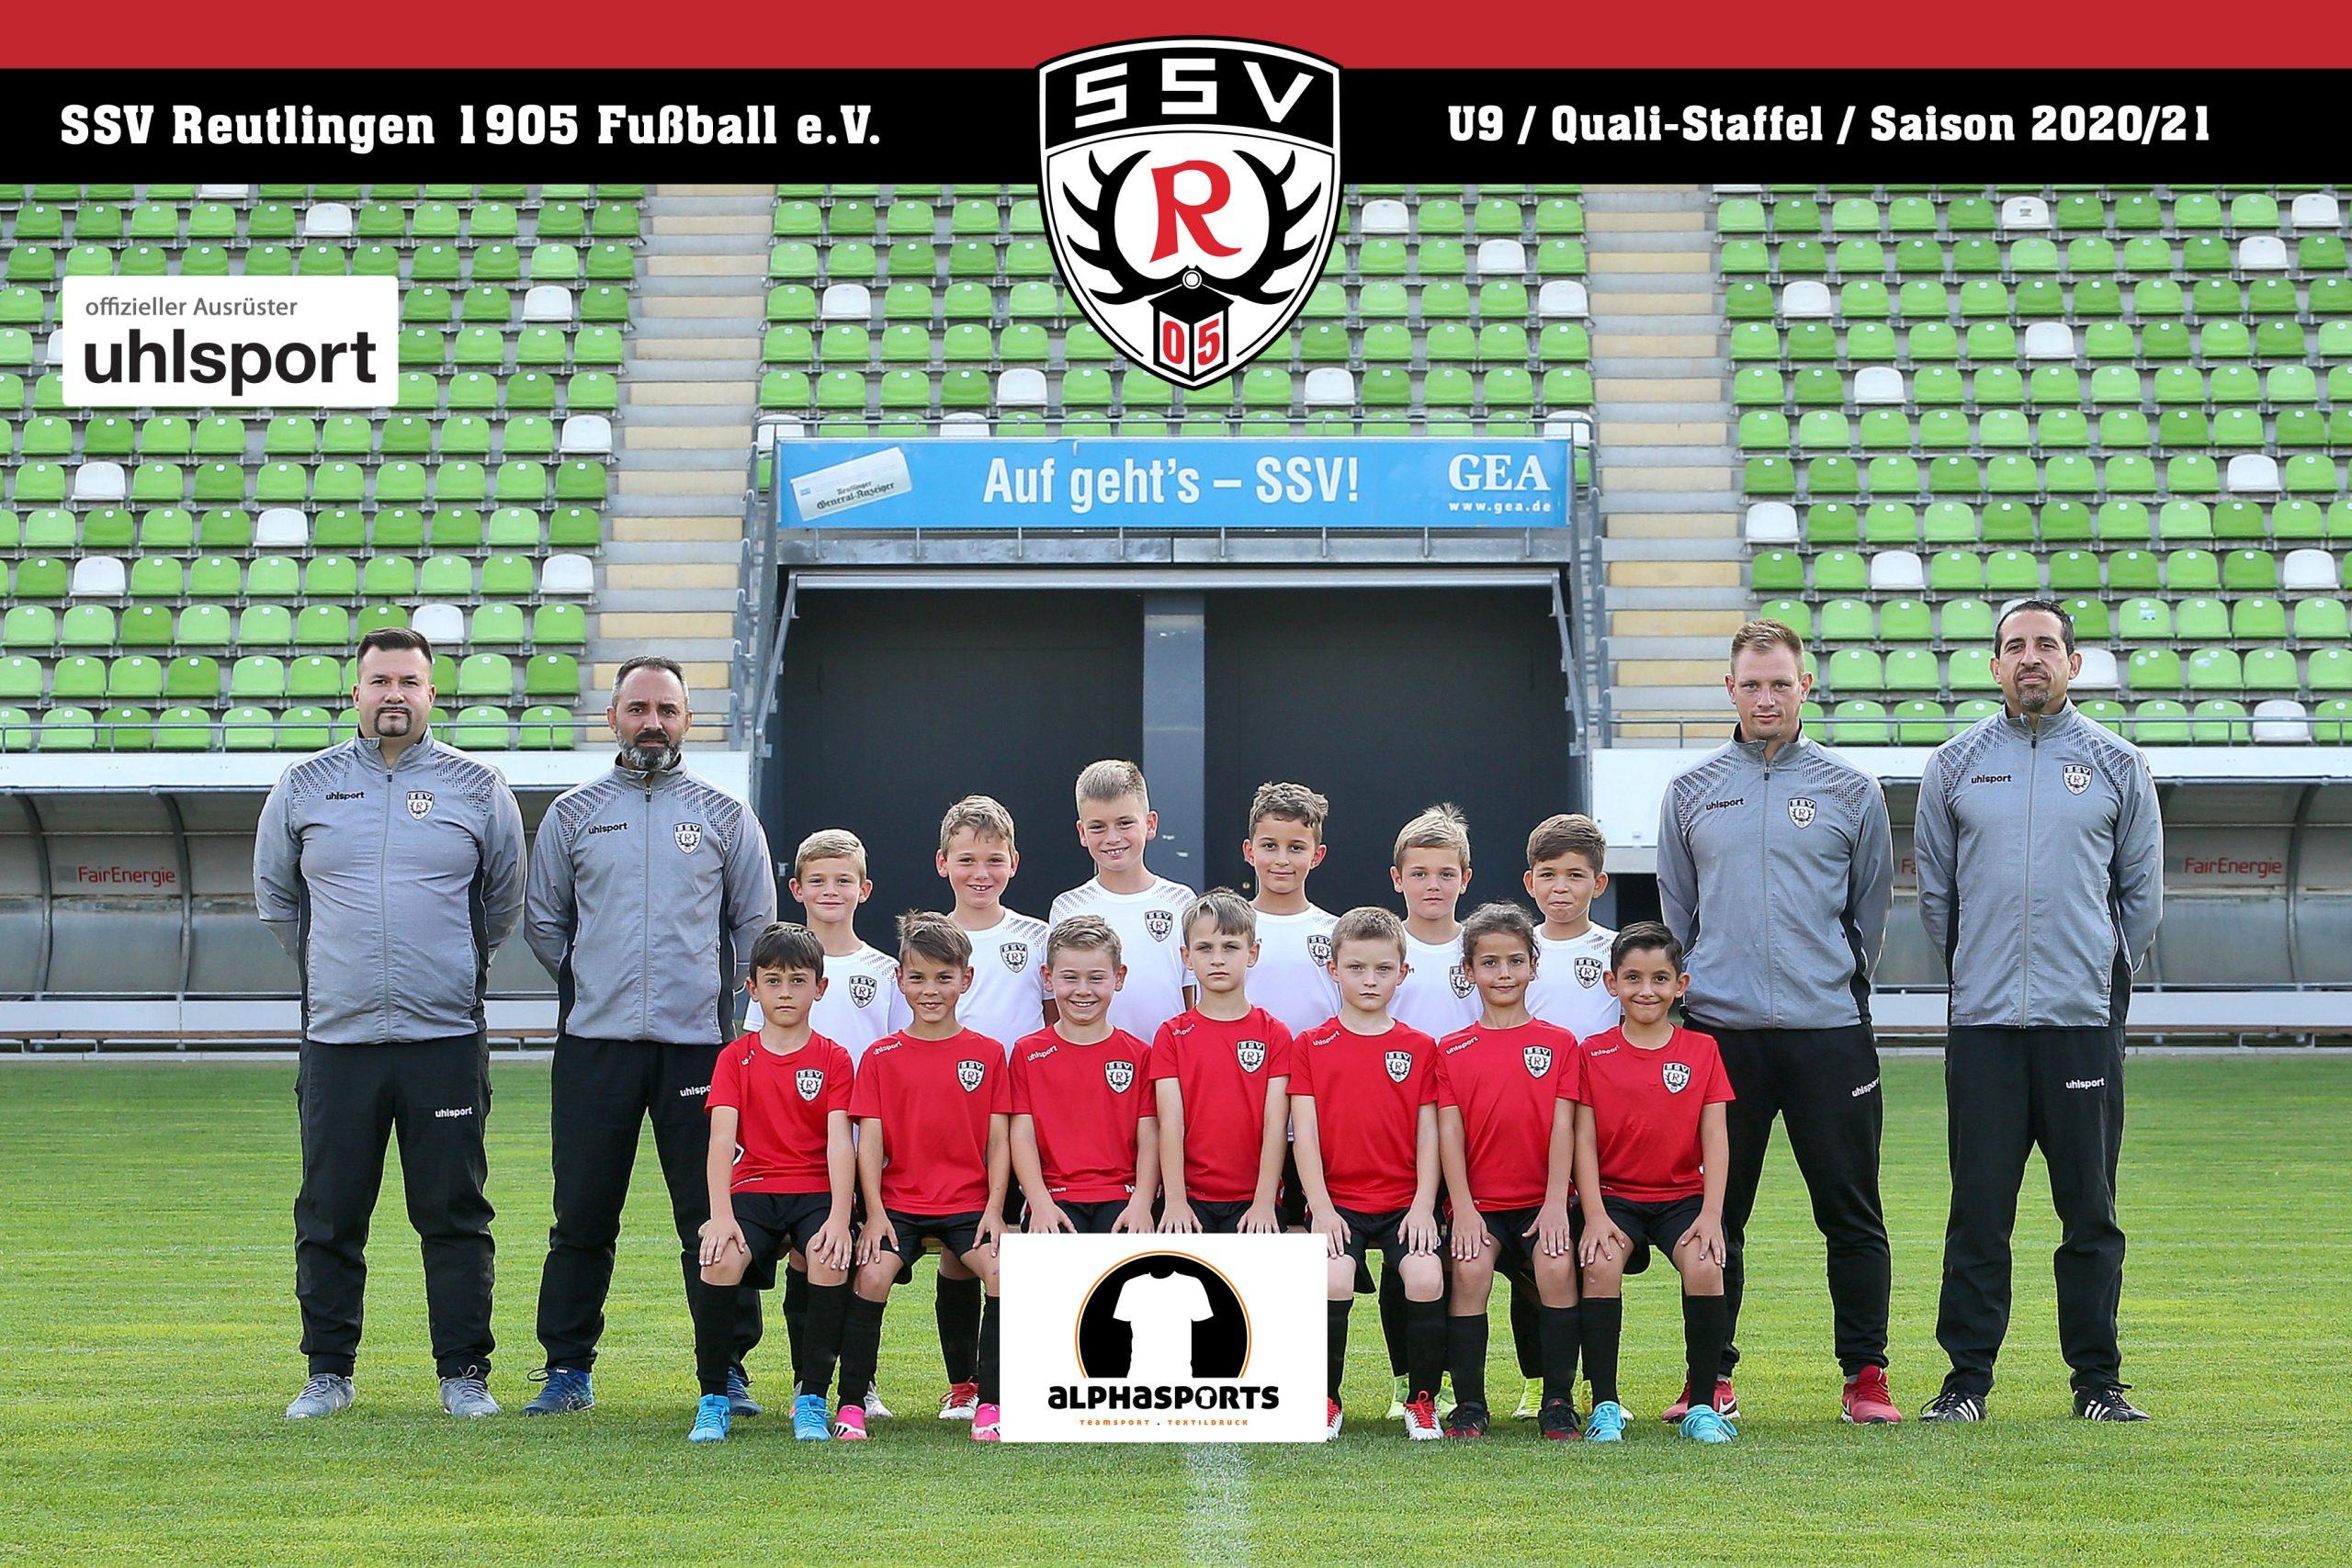 SSV Reutlingen U9 - Saison 2020/21